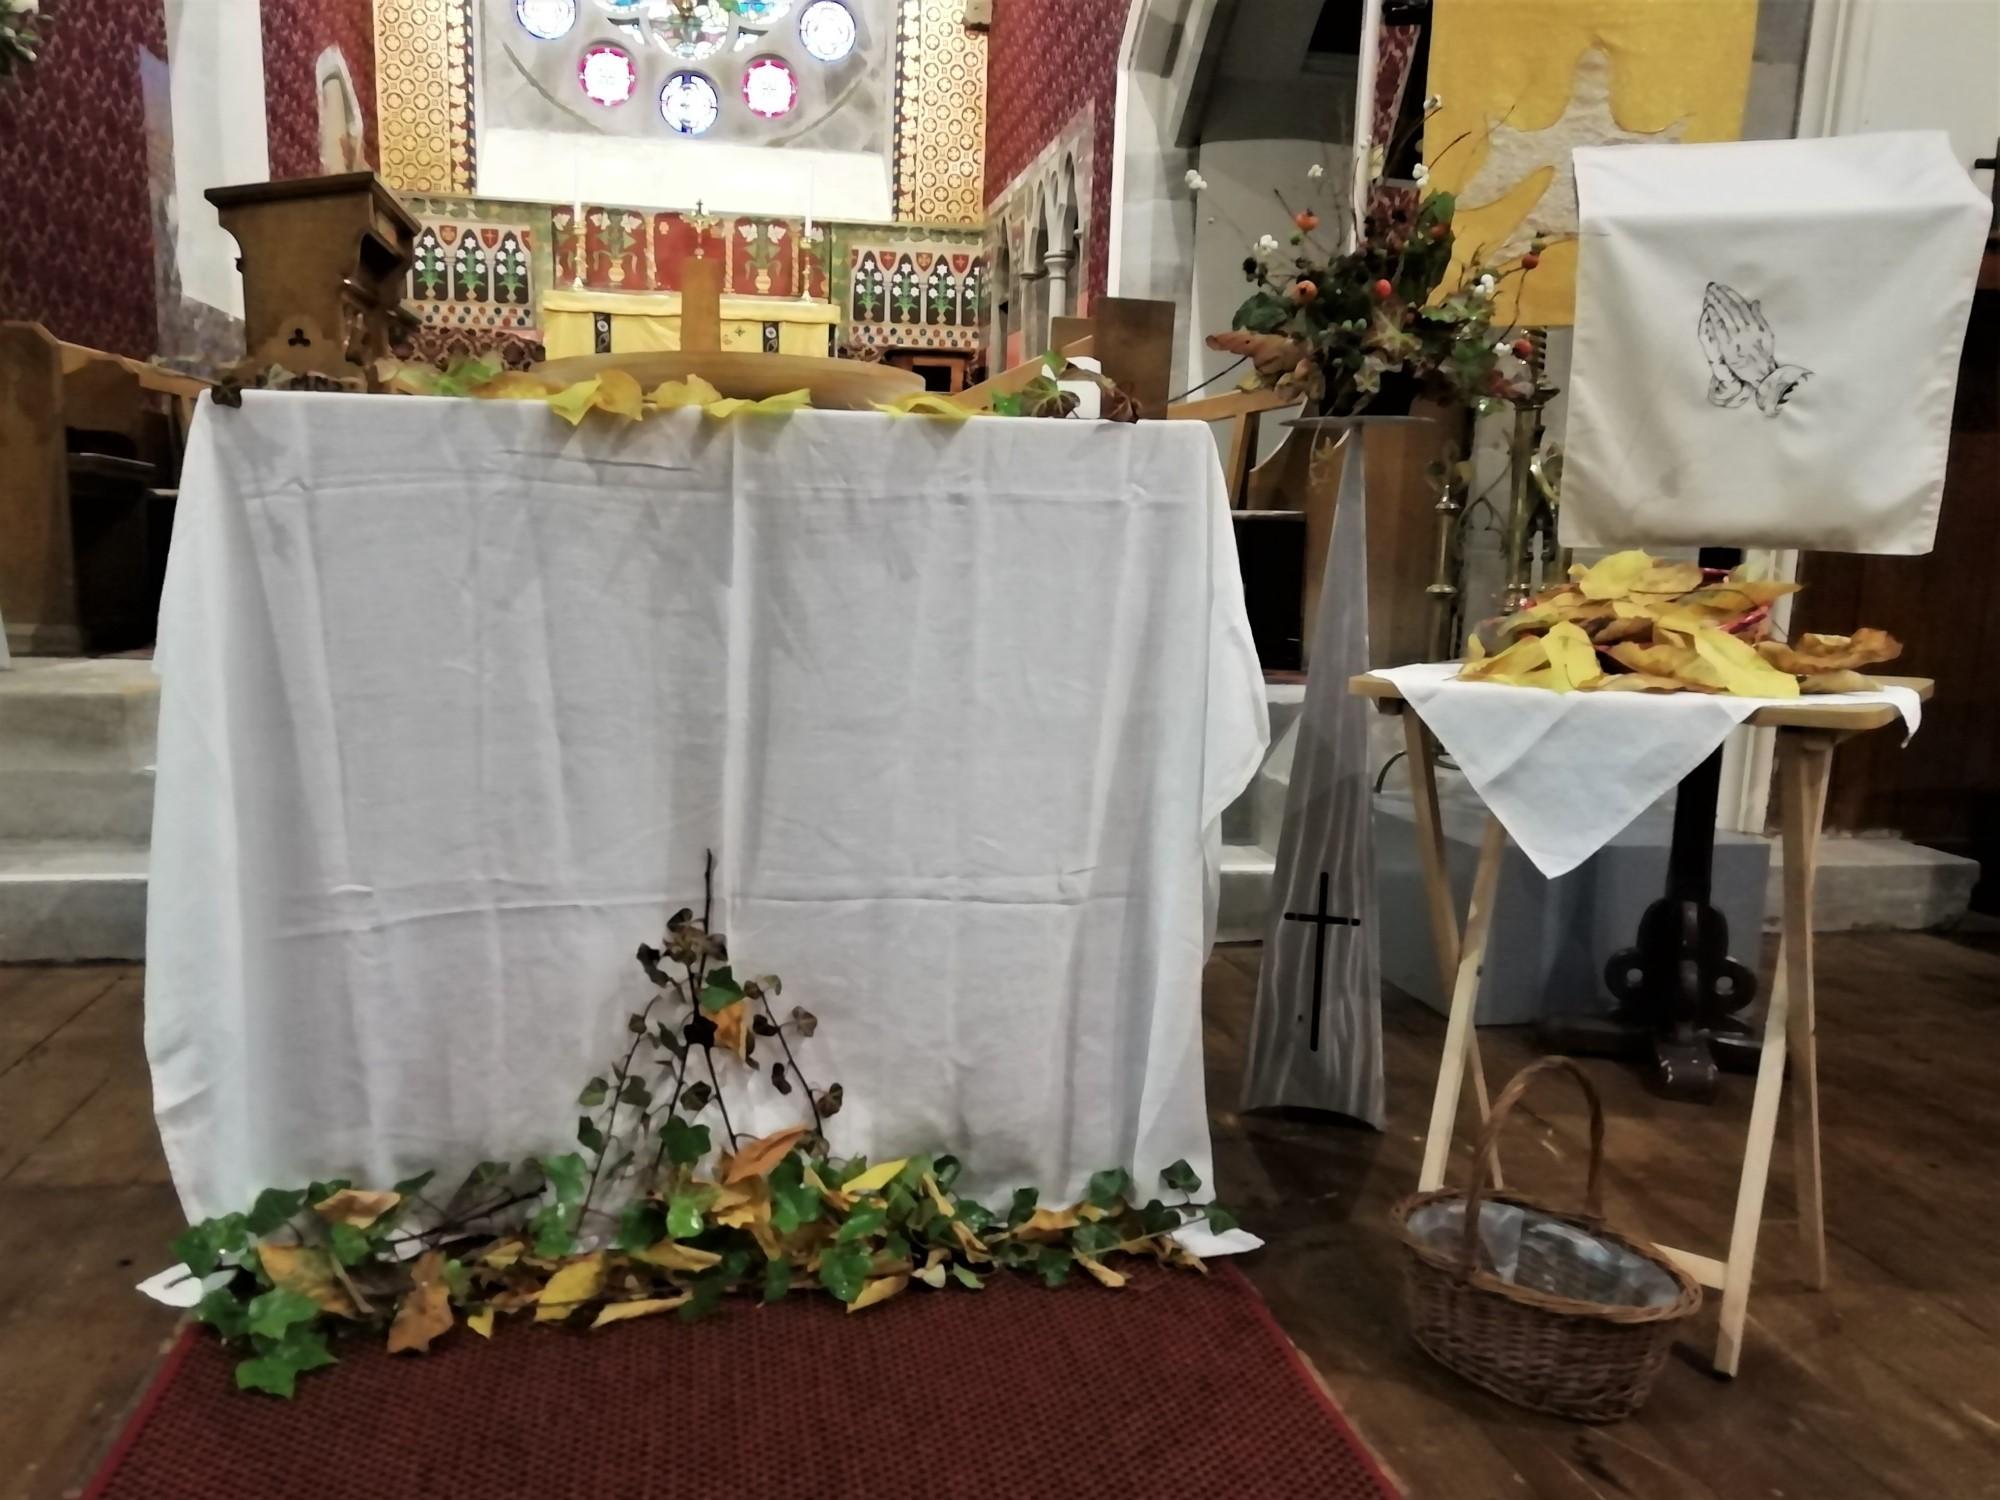 Fallen Leaves All Souls Day Service 2019